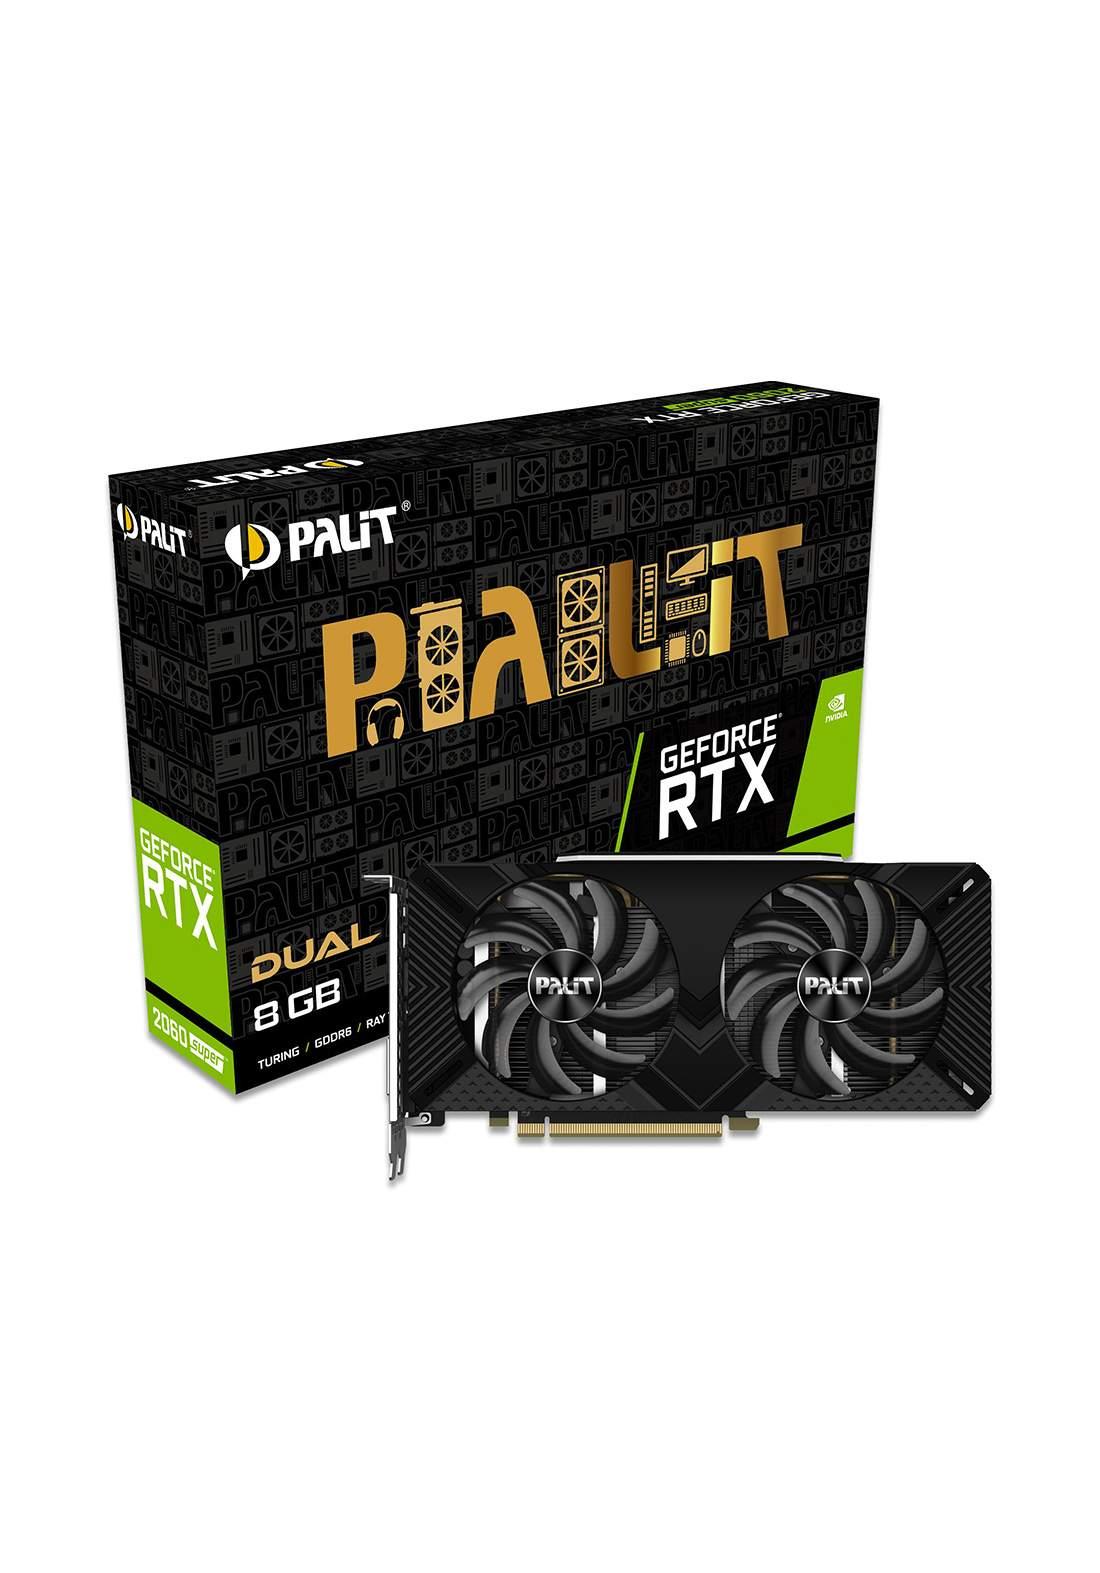 Palit GeForce RTX 2060 Super GameRock Graphics Card